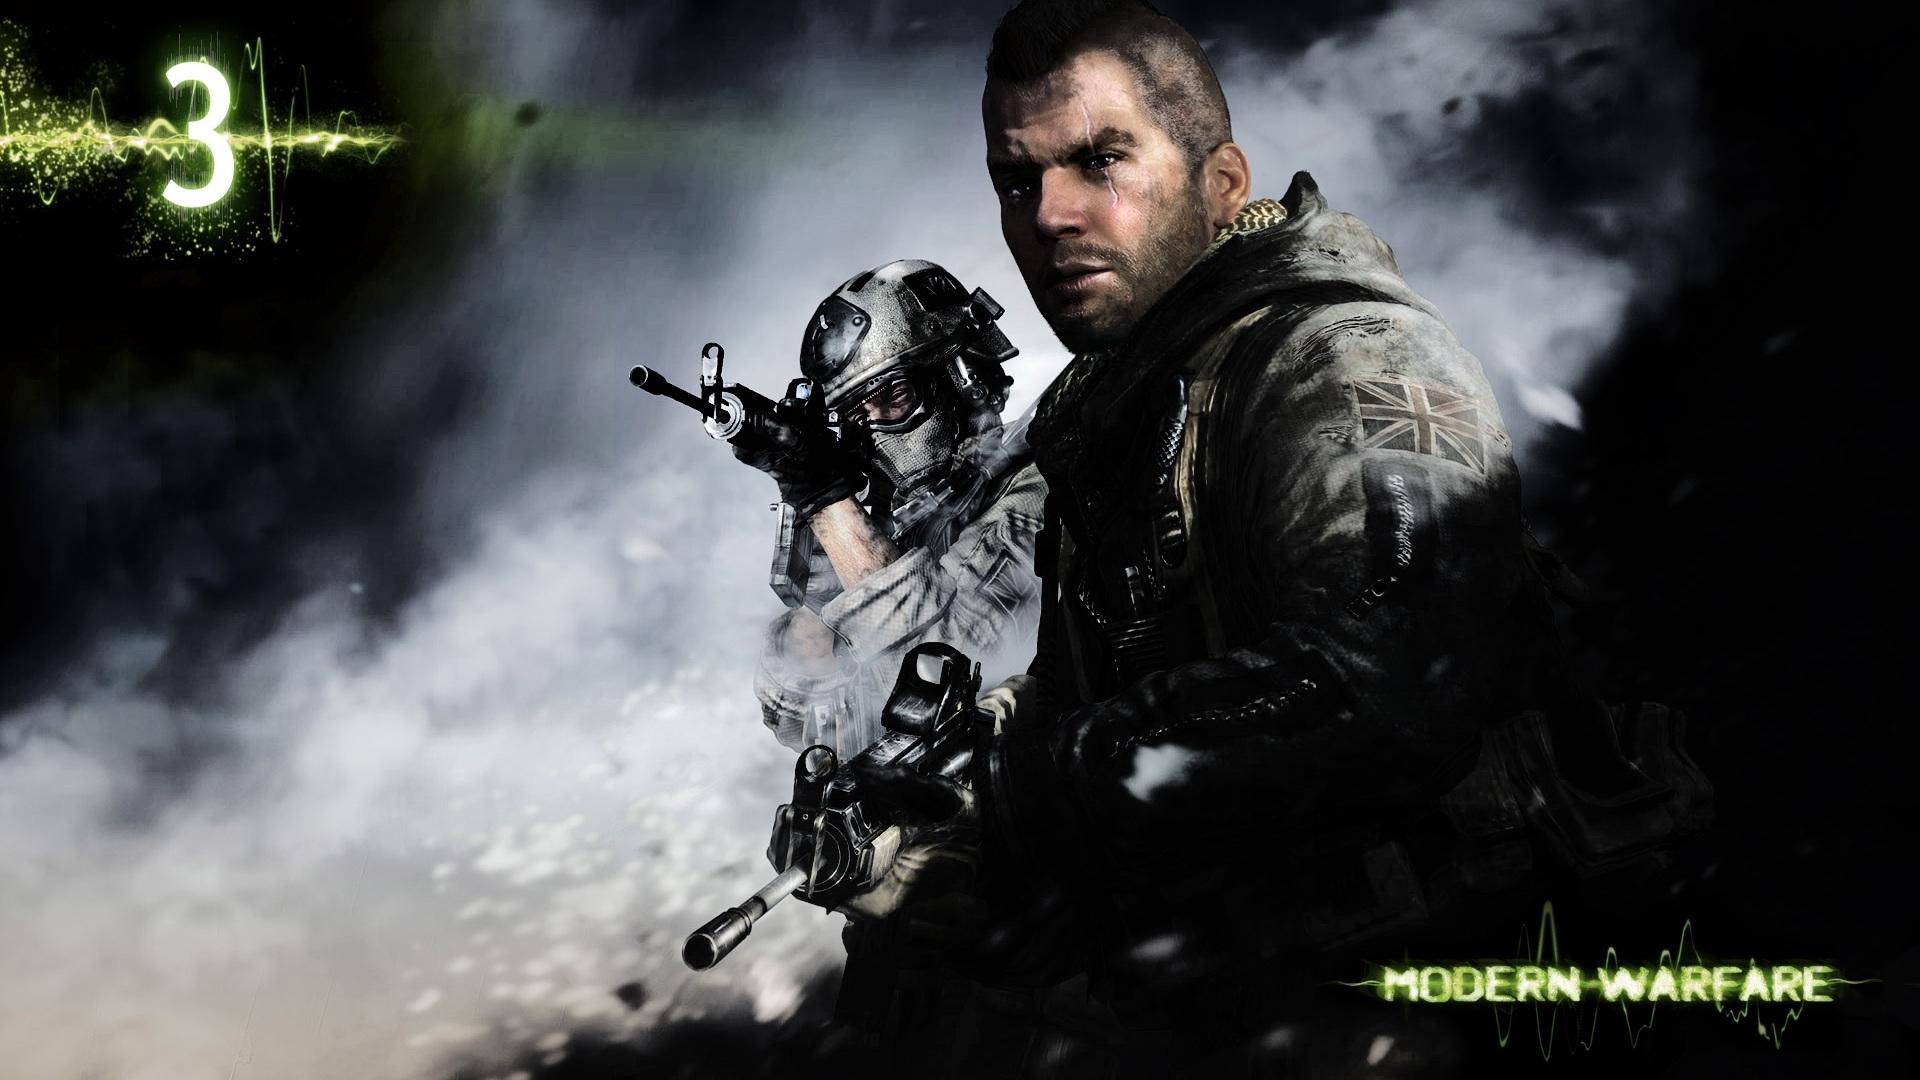 Call Of Duty Modern Warfare 3 Soldiers Scar